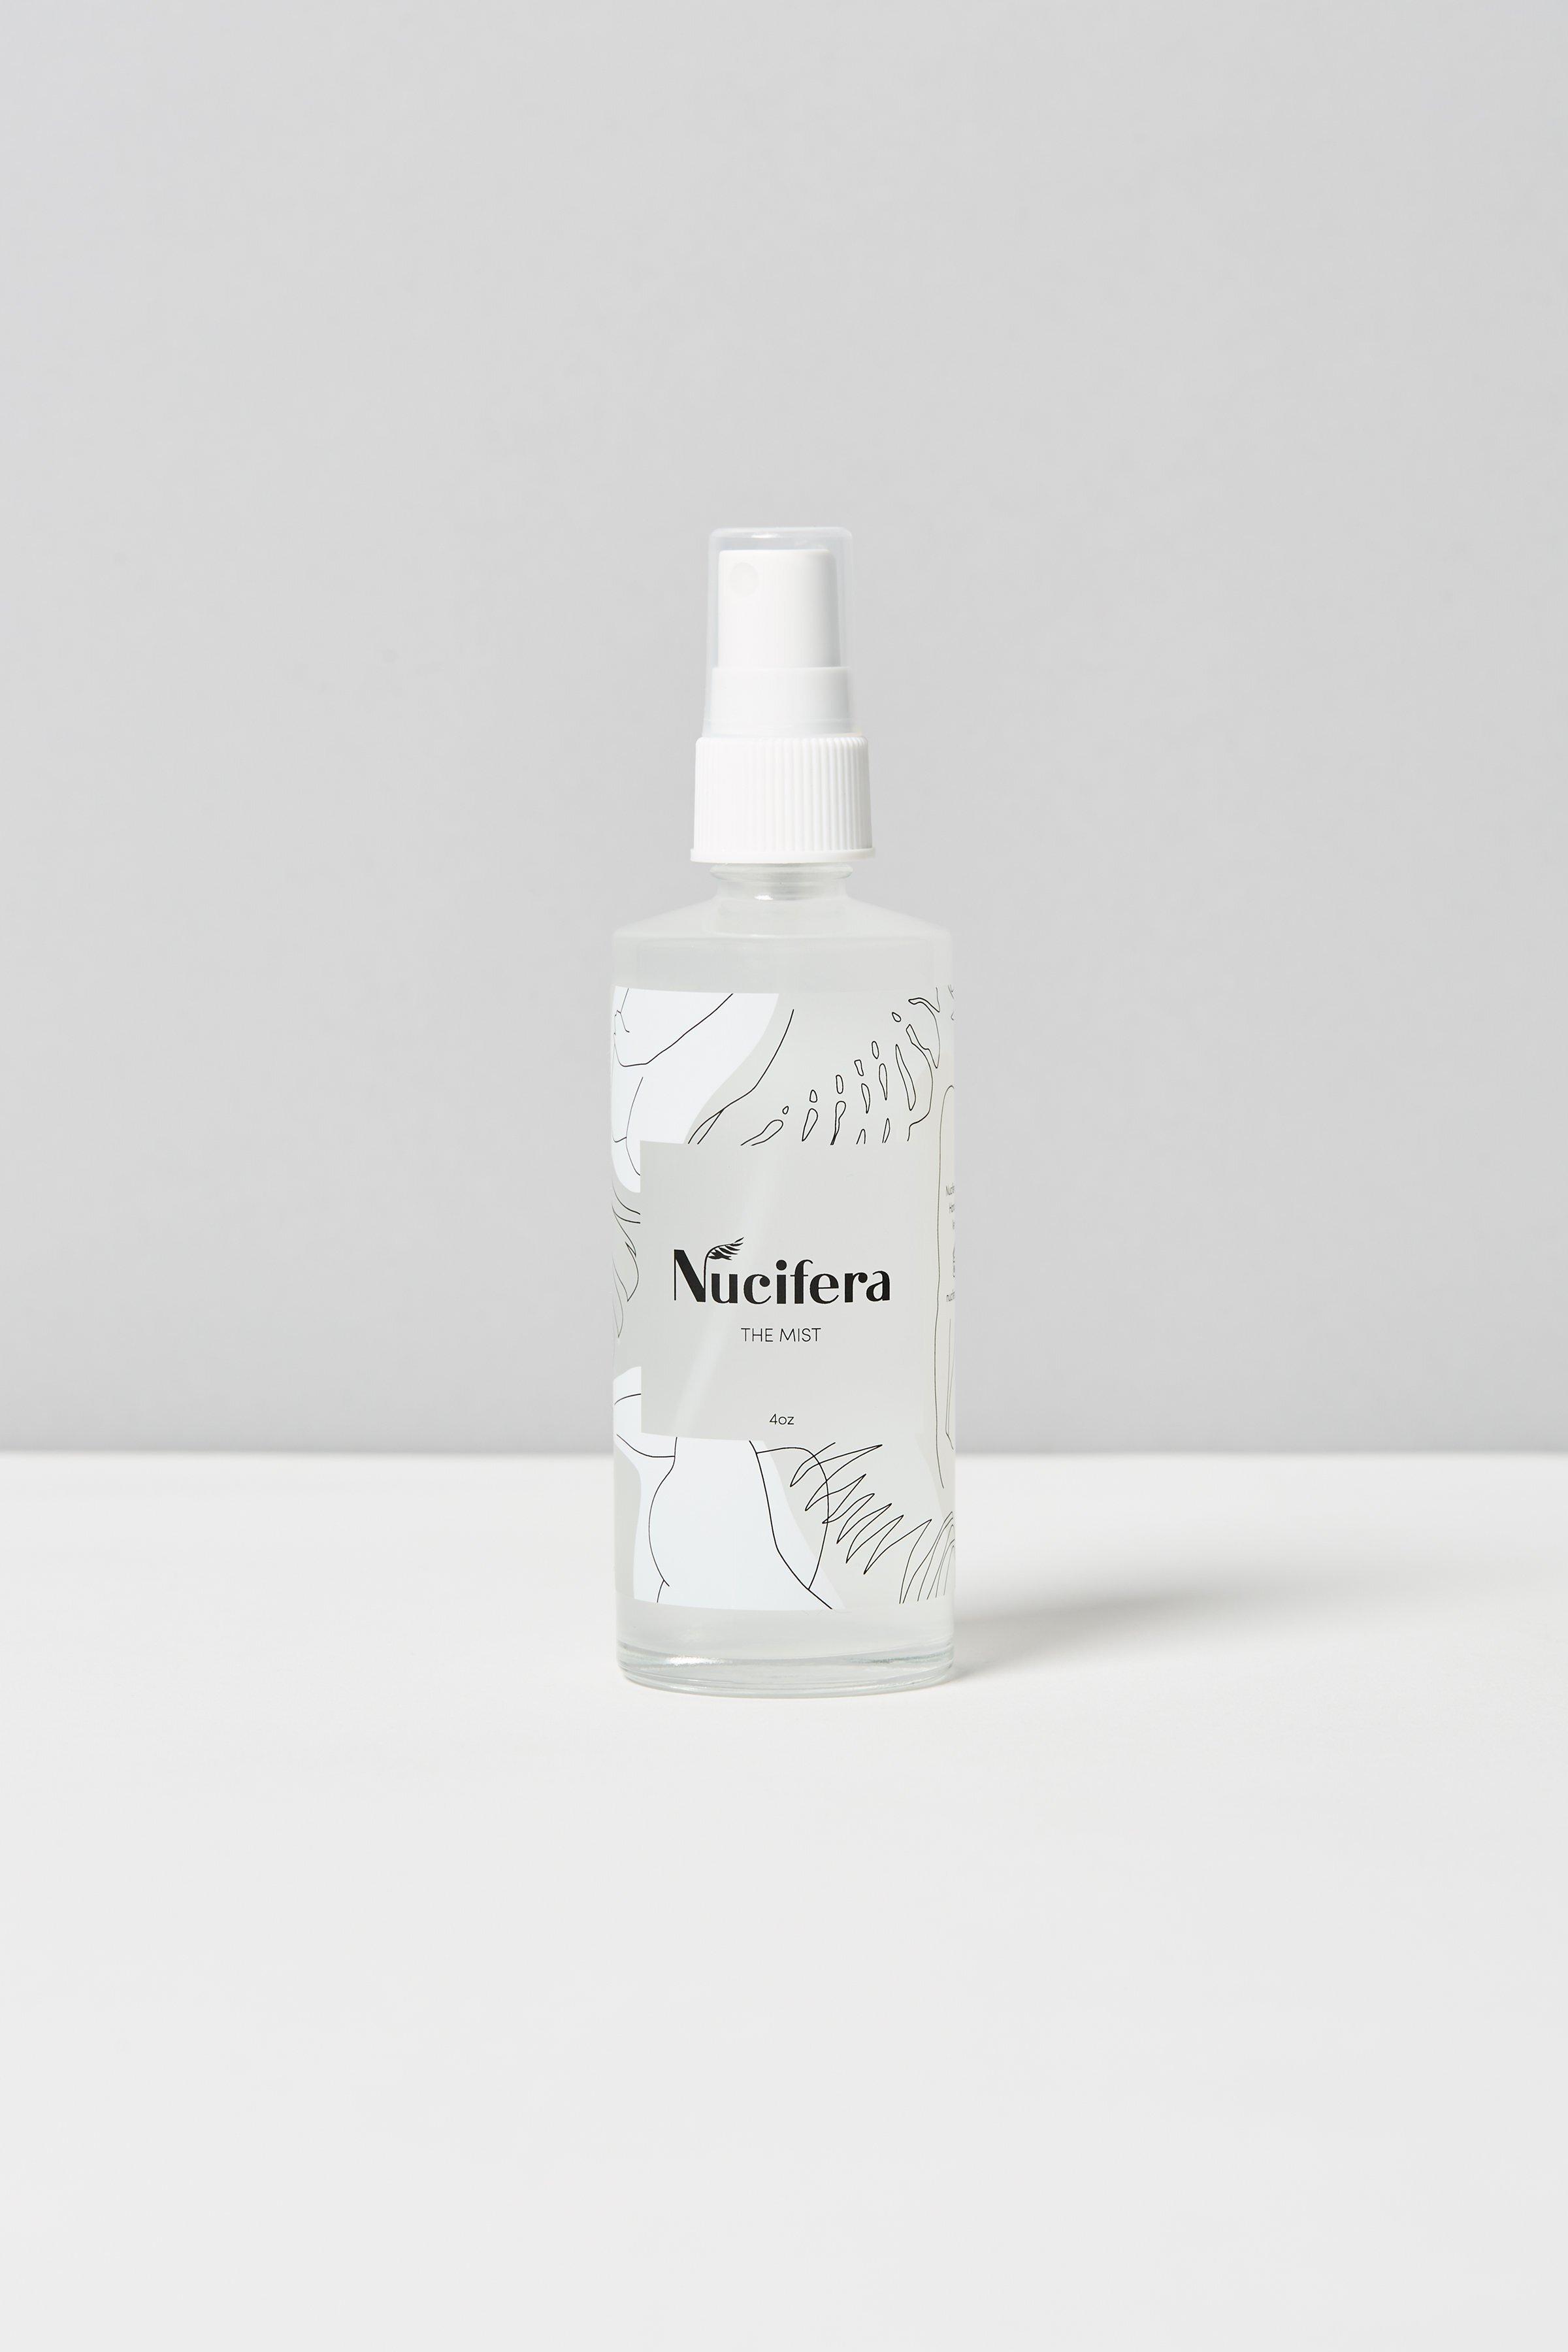 Nucifera The Mist - $37